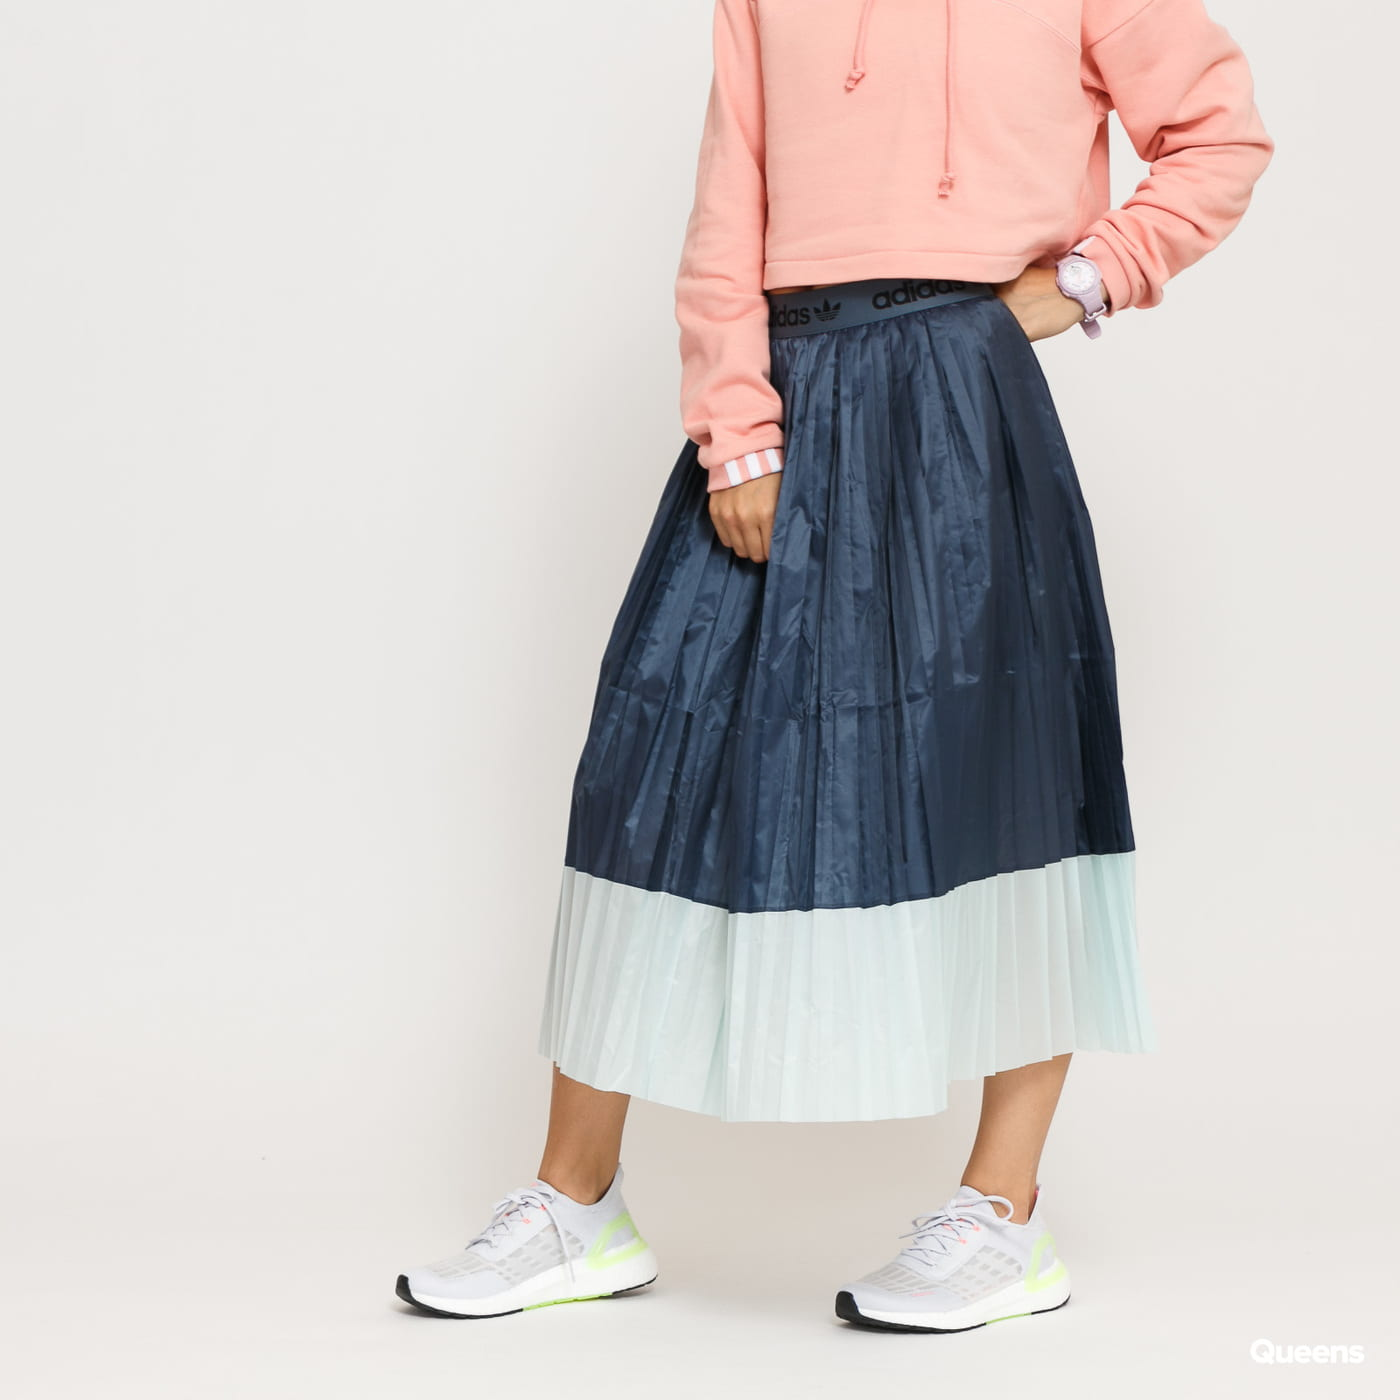 adidas Originals Pleated Skirt dark grey / light green